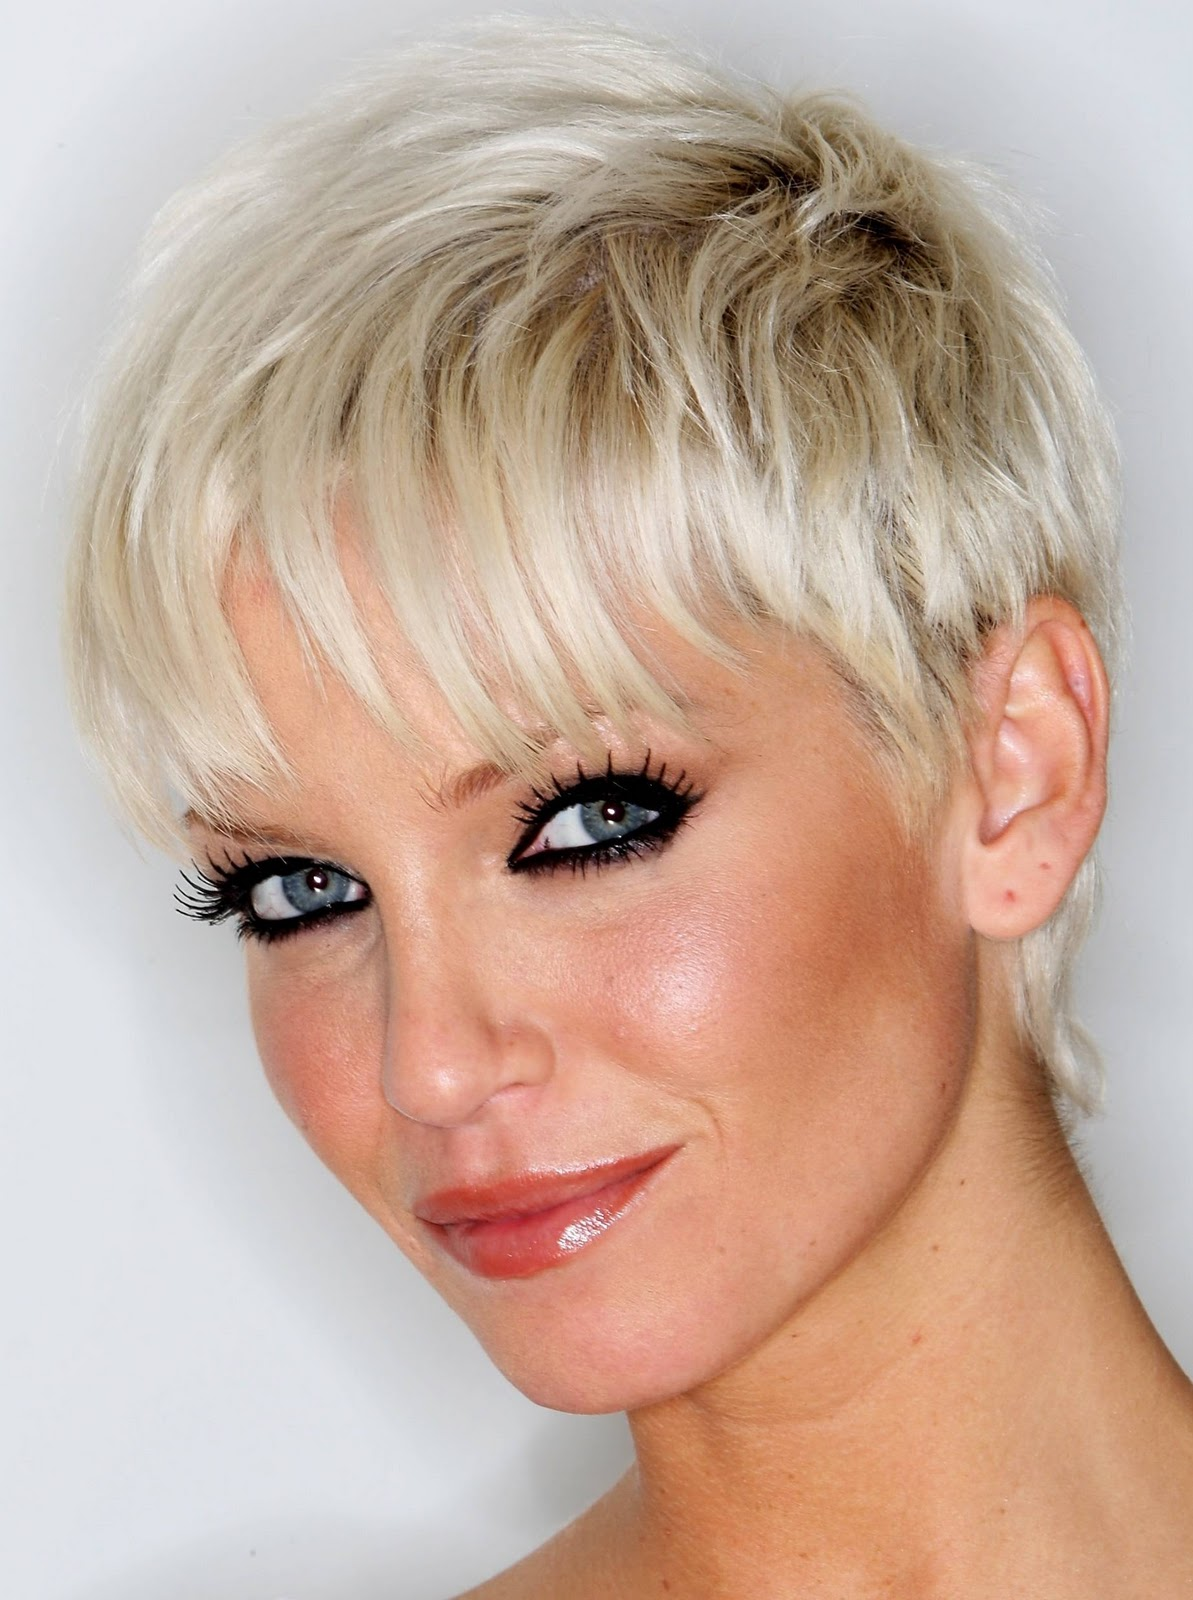 sarah harding hairstyle - short hair - celebrities style